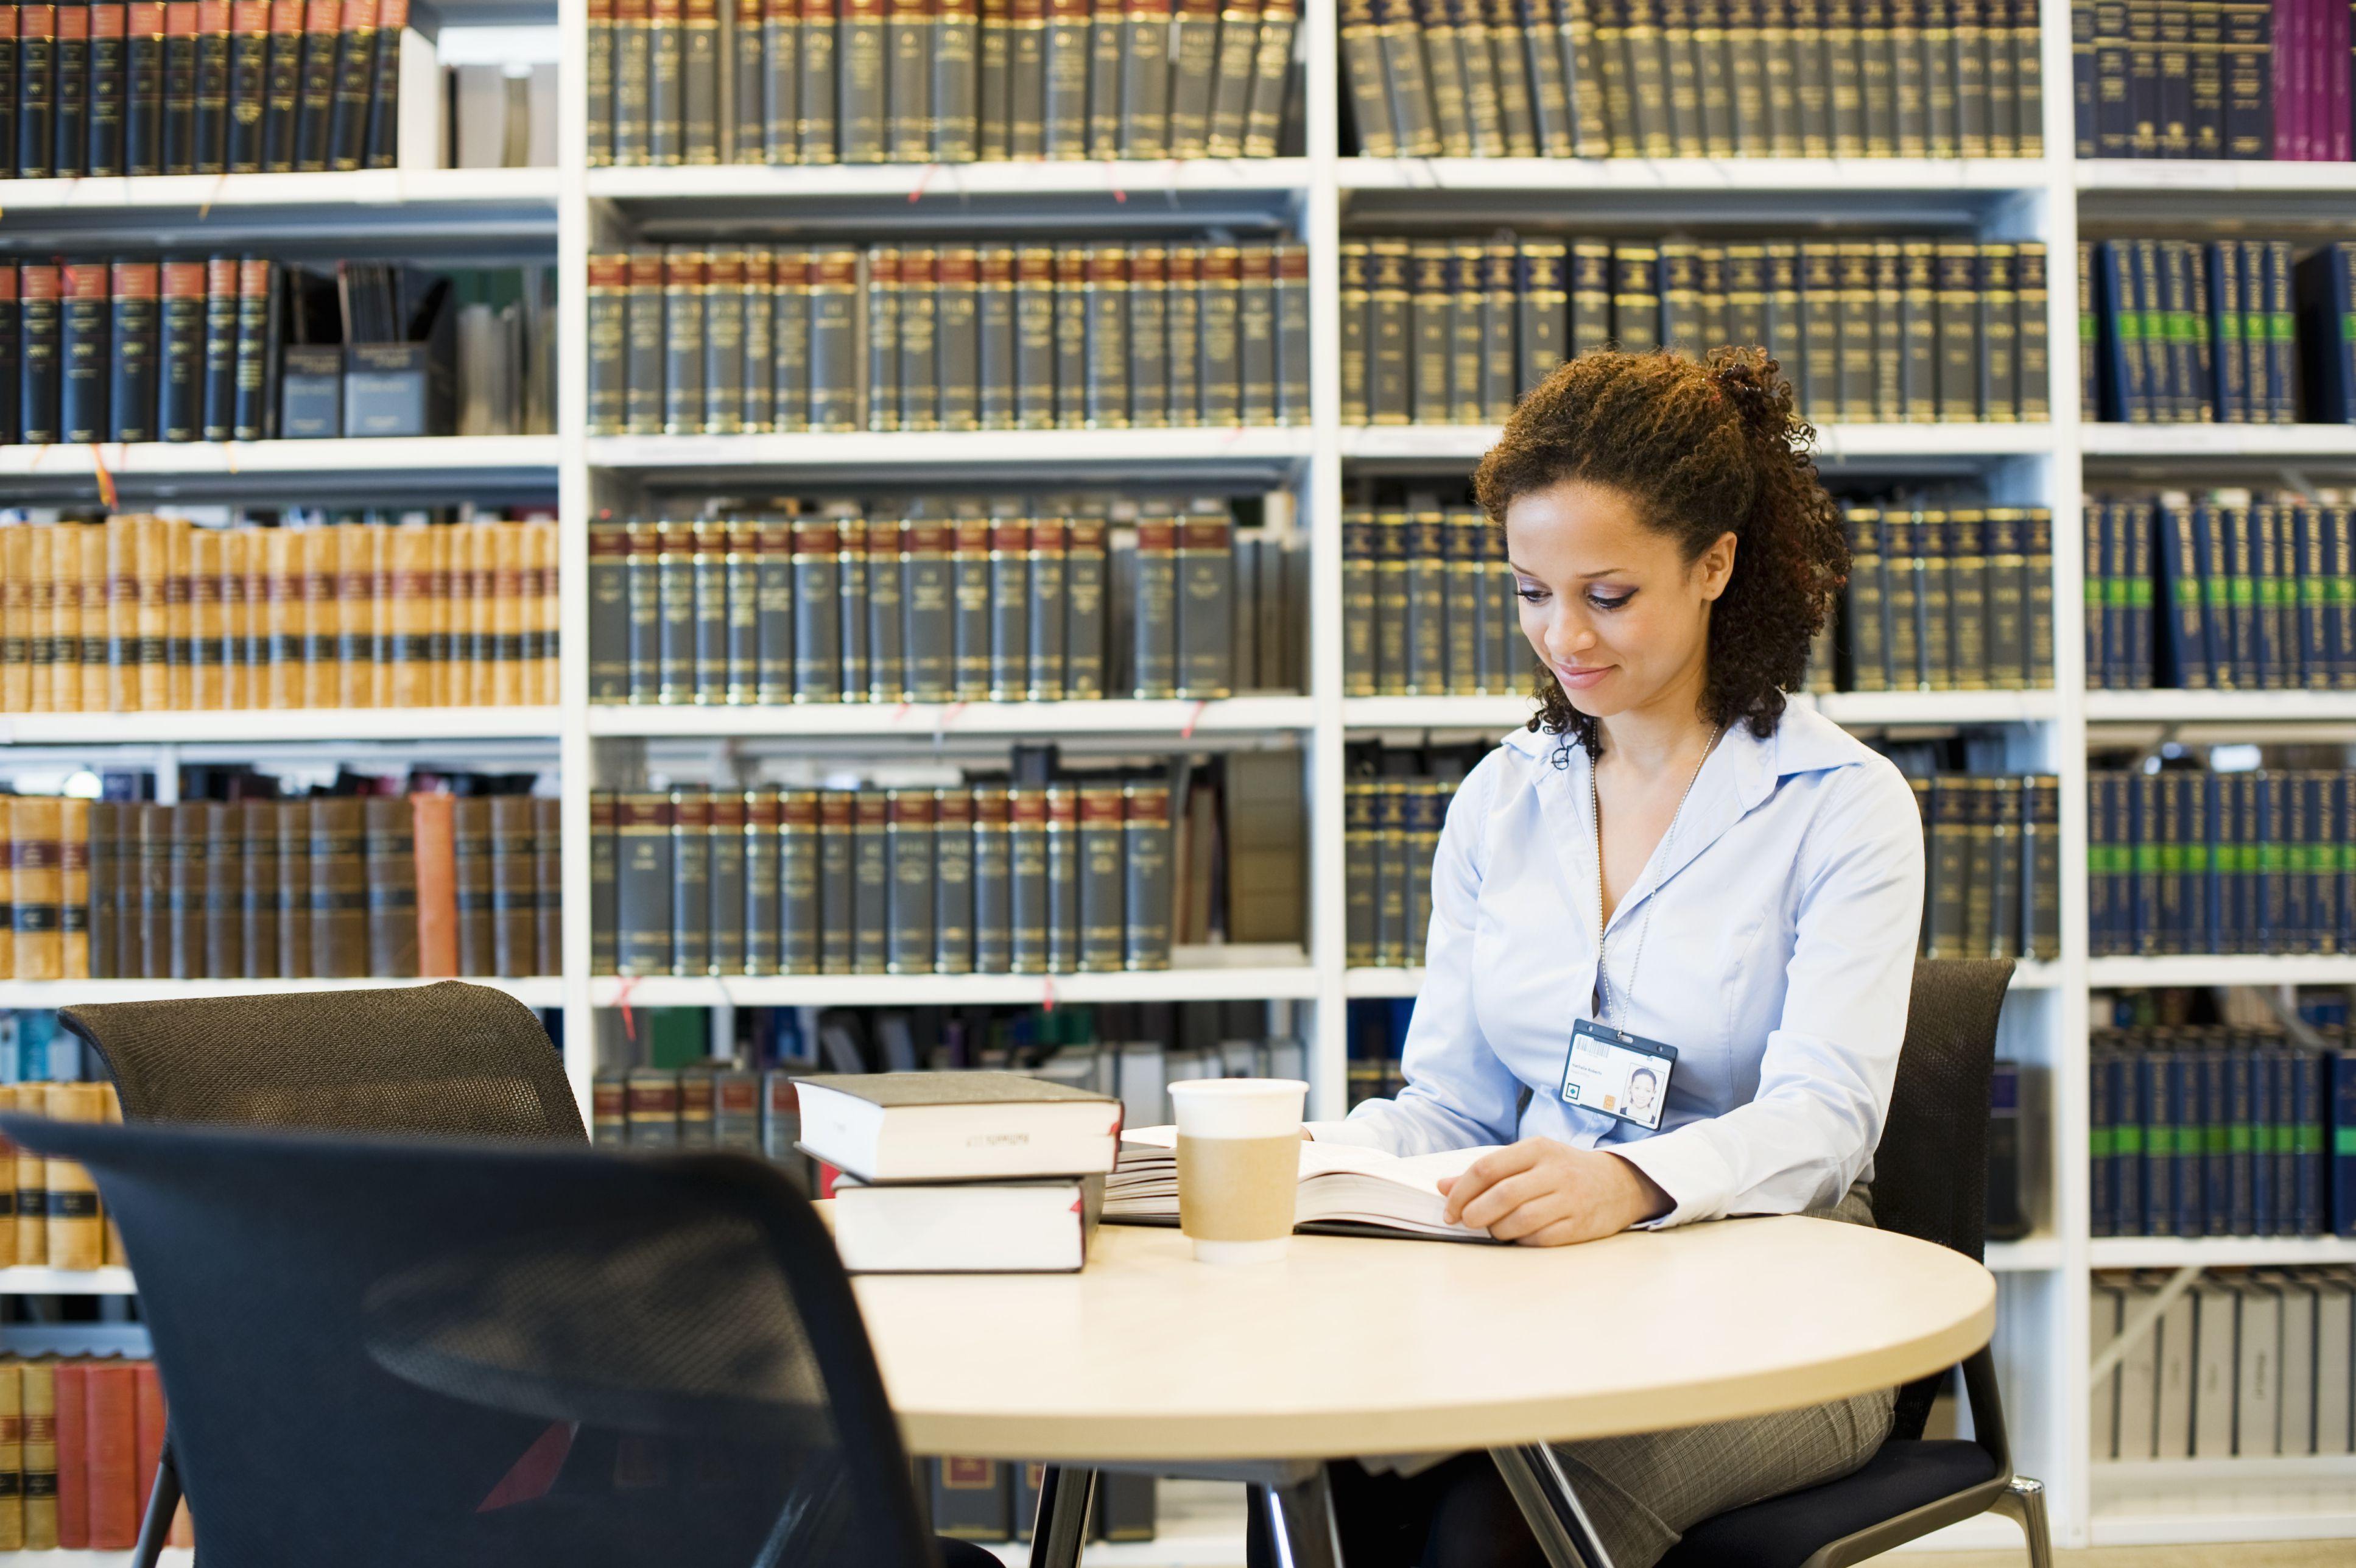 Law student pics 71